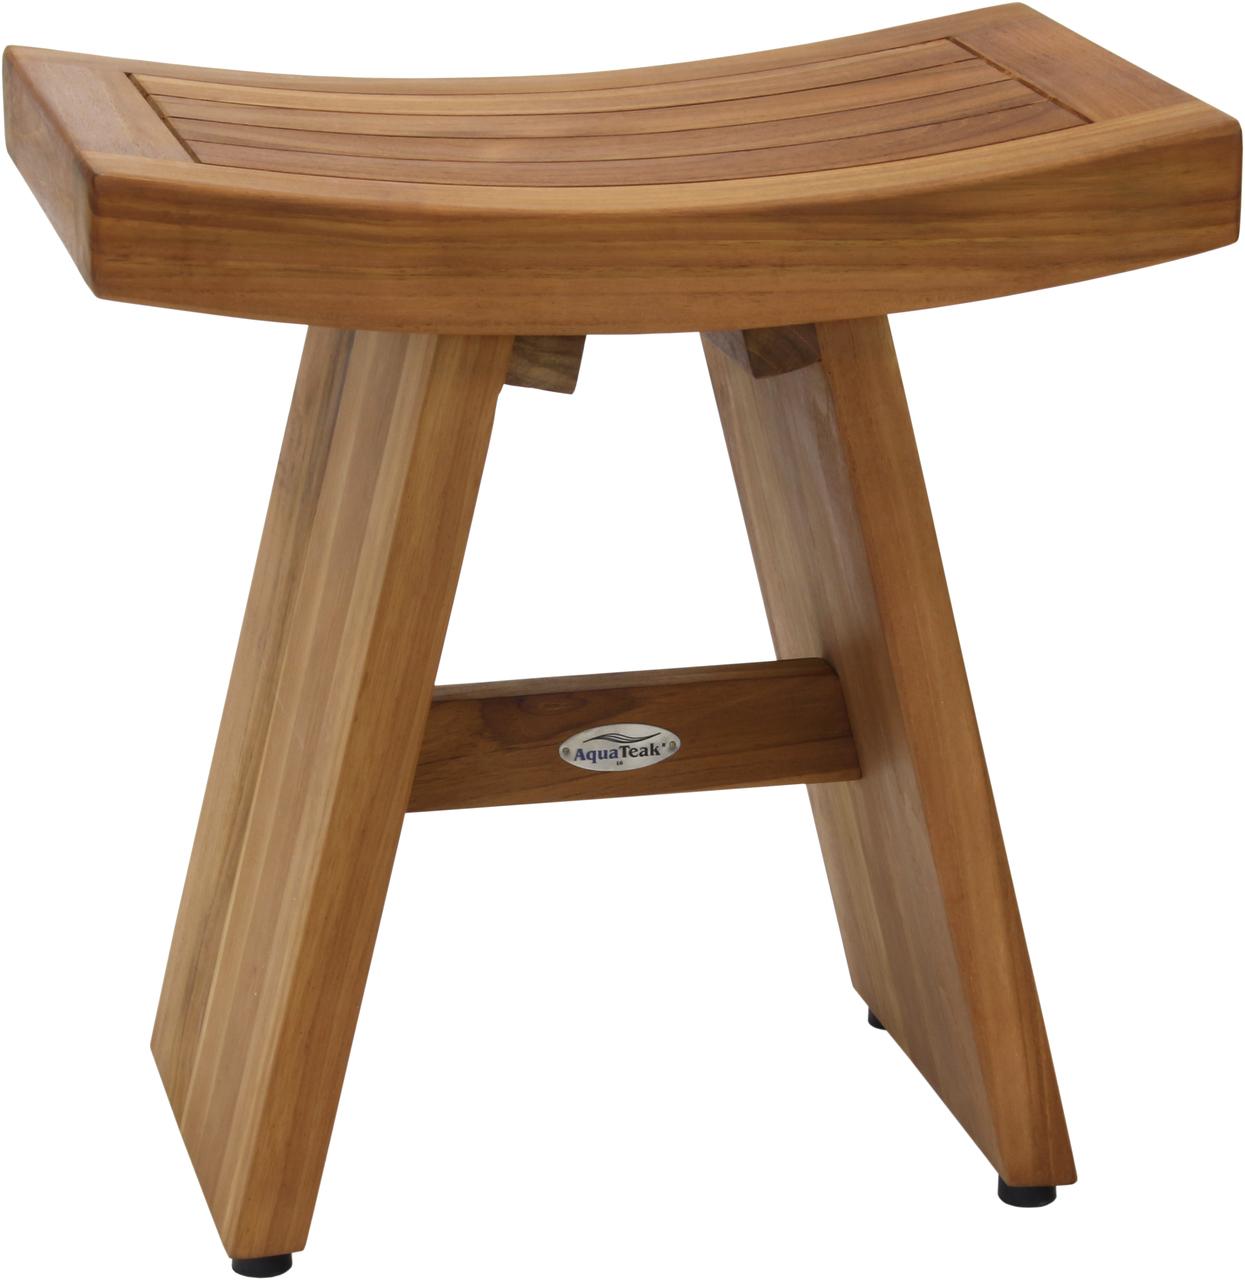 18 Asia Teak Shower Bench Quality Design And Function I Aquateak